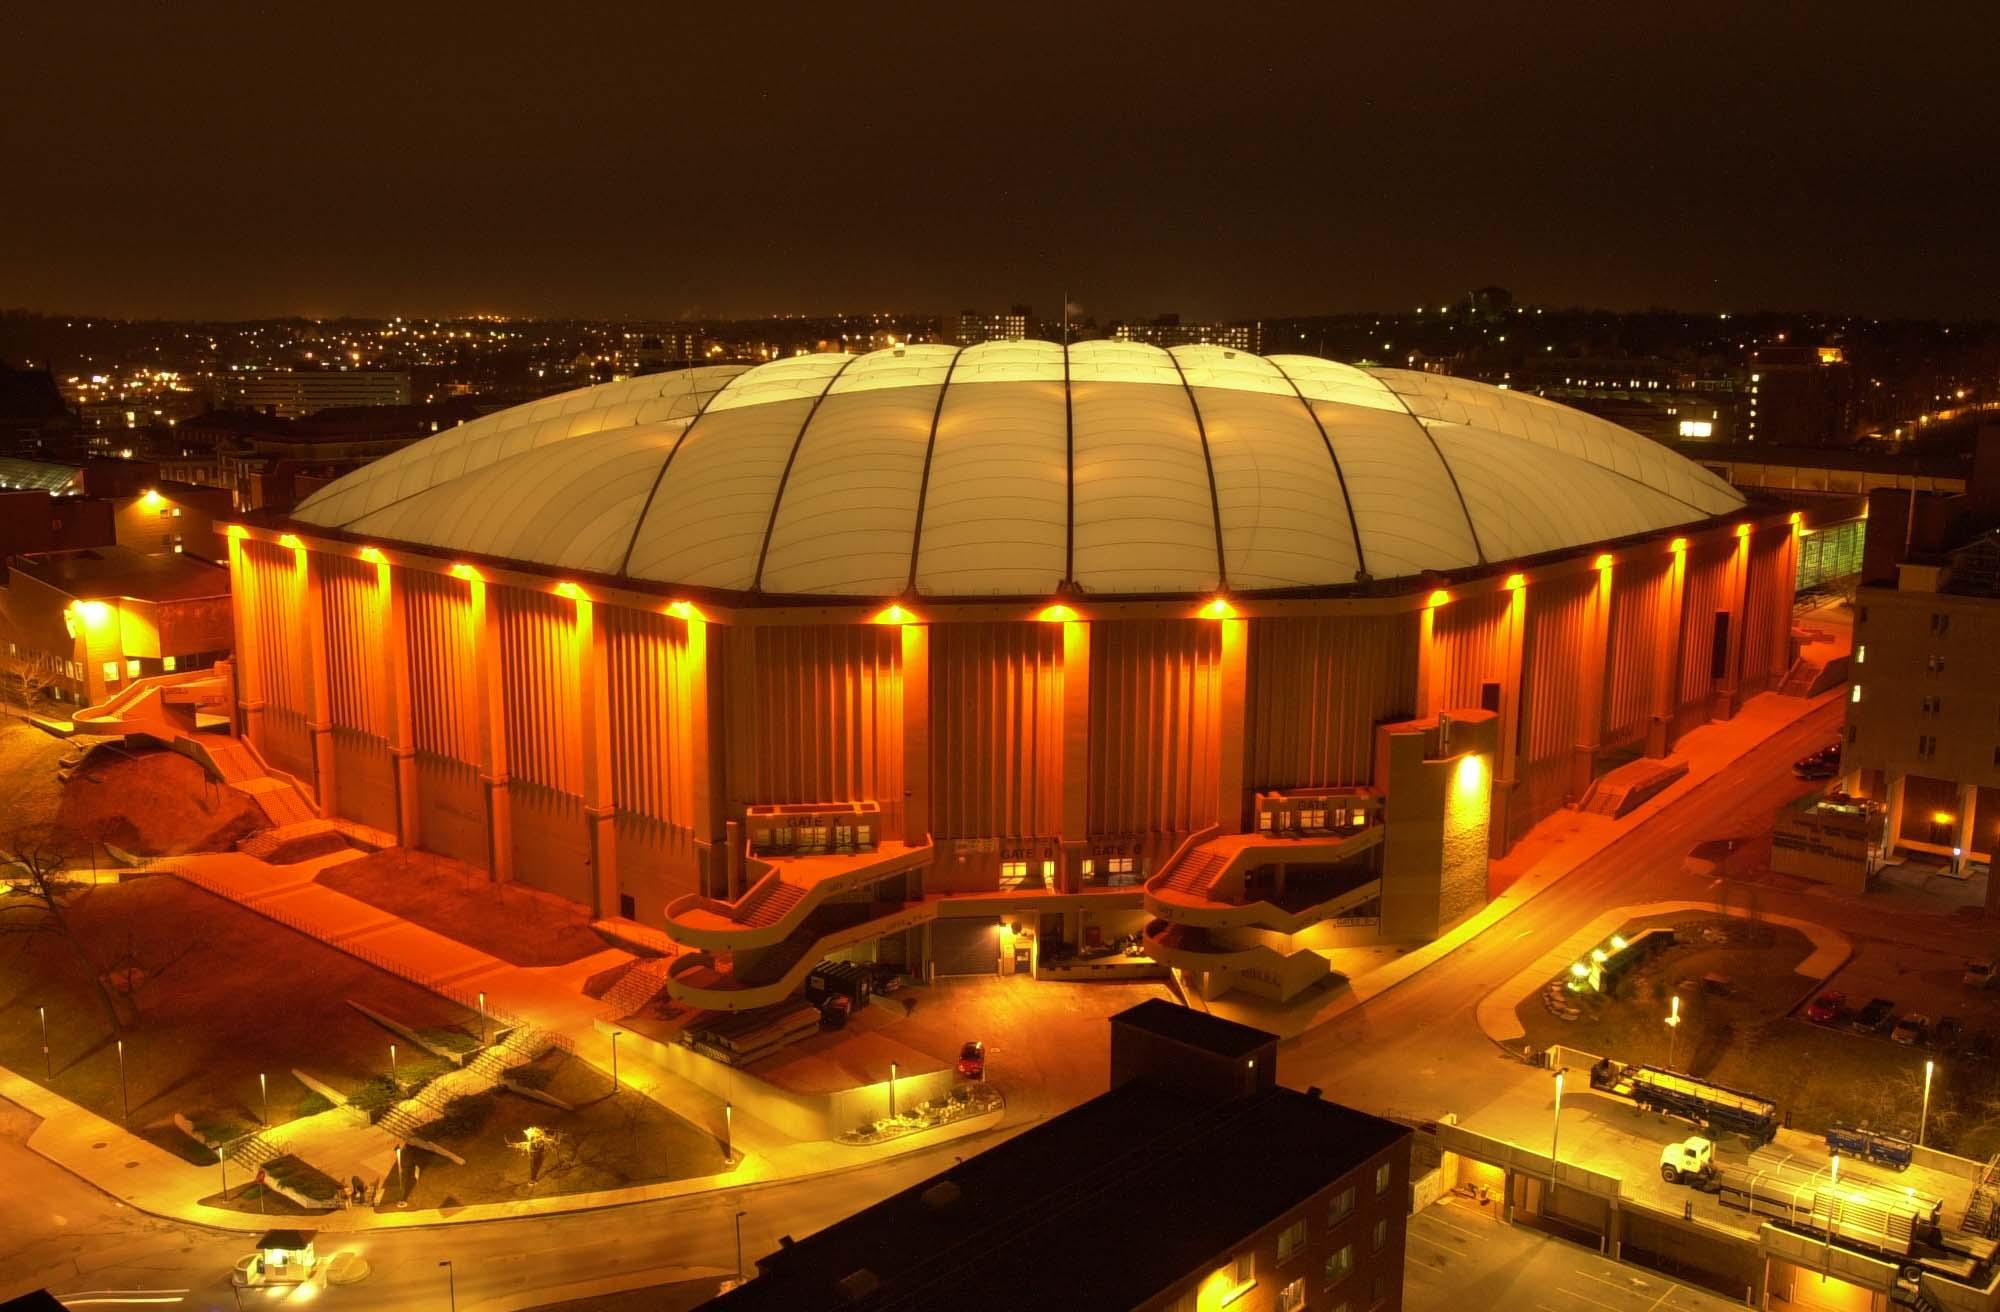 carrier dome night orange light 2000x1312